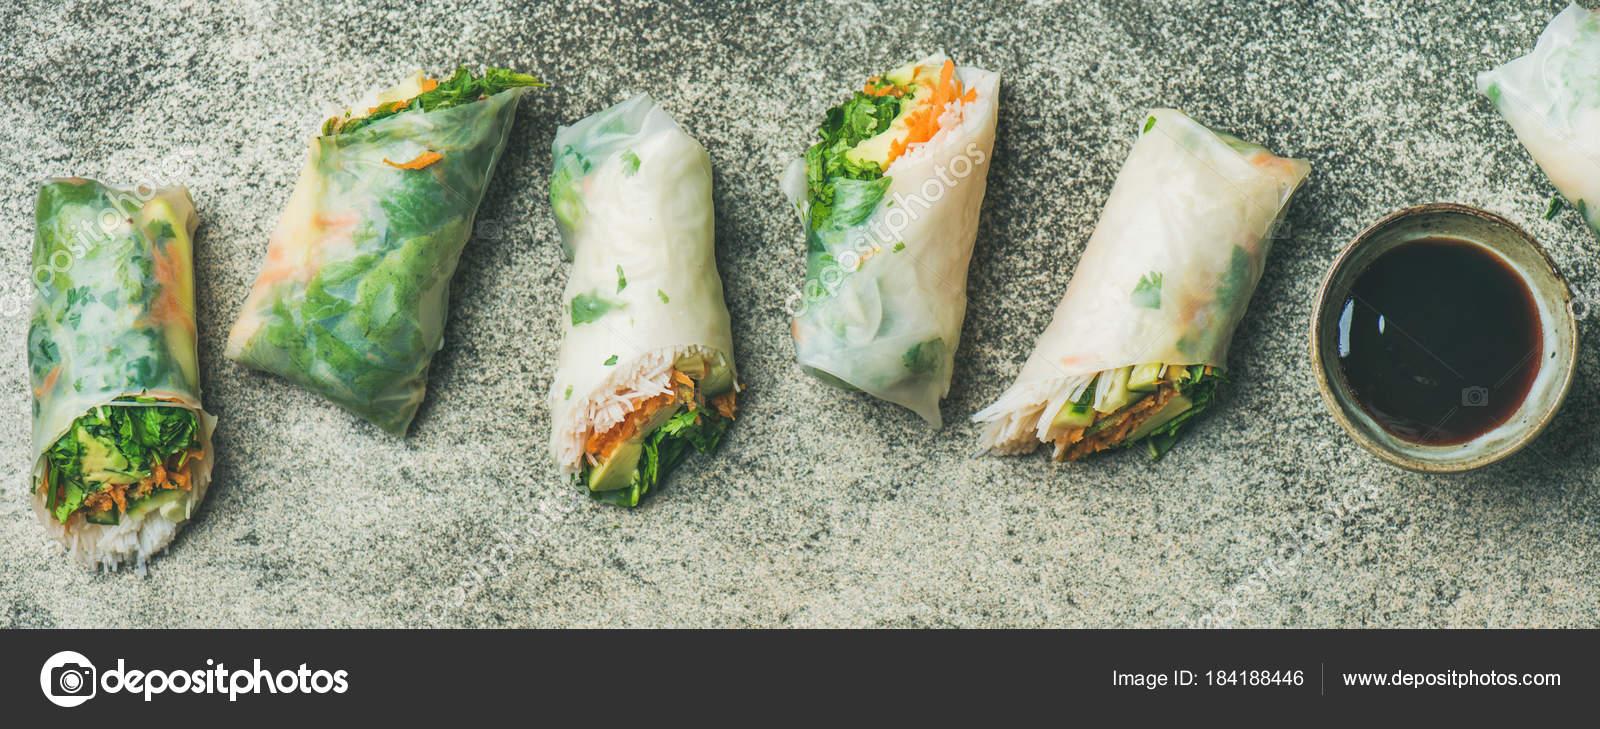 rotoli di carta di riso primavera vegan — Foto Stock © sonyakamoz ...